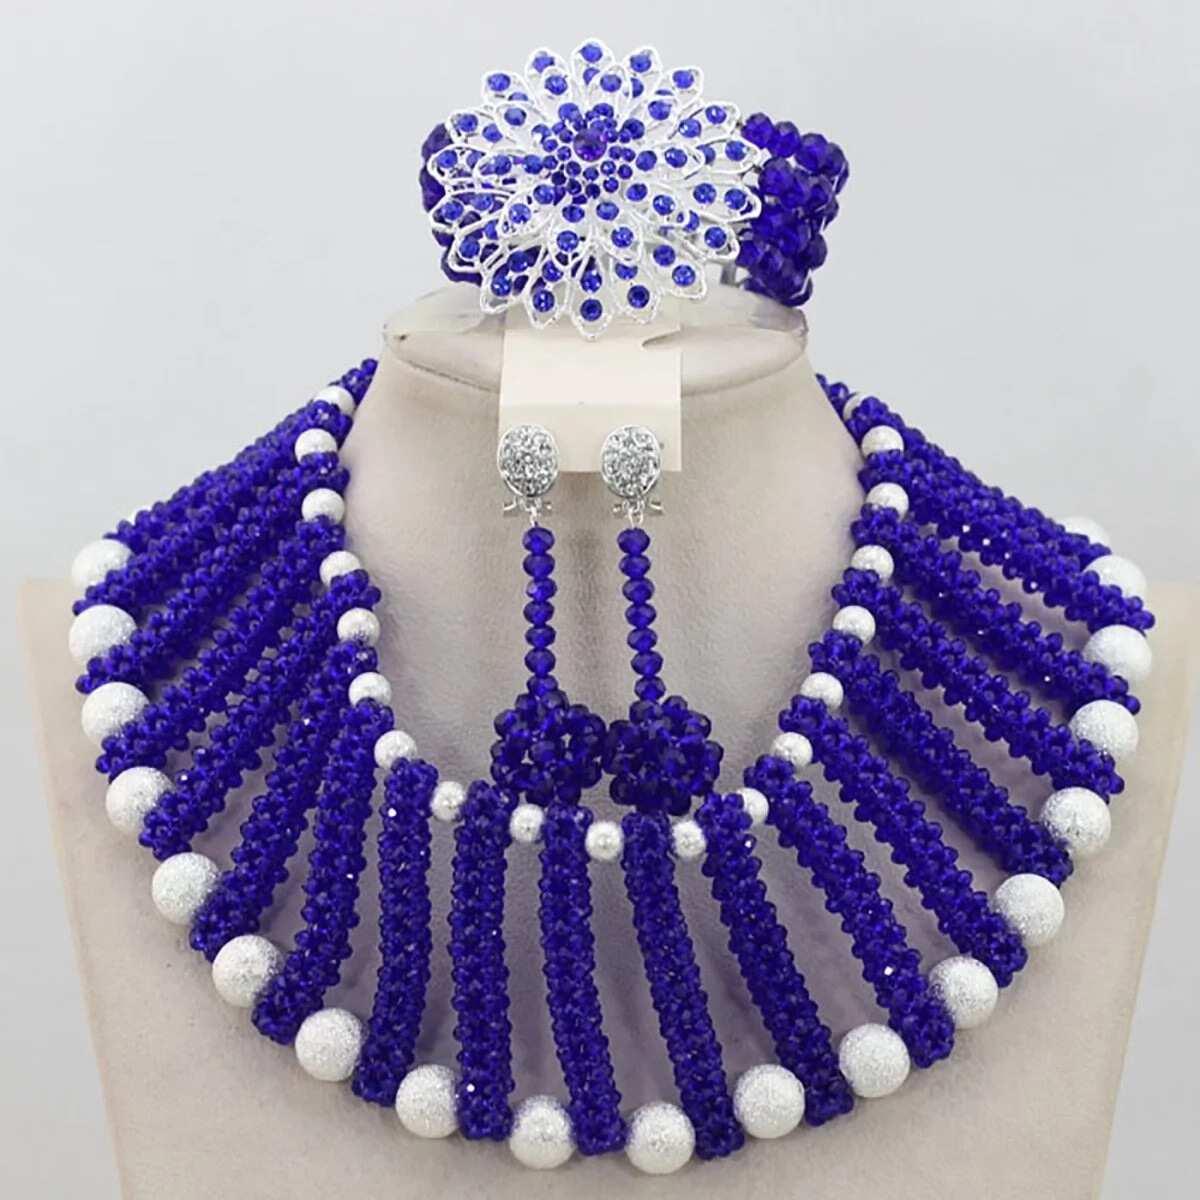 Bead making designs in Nigeria